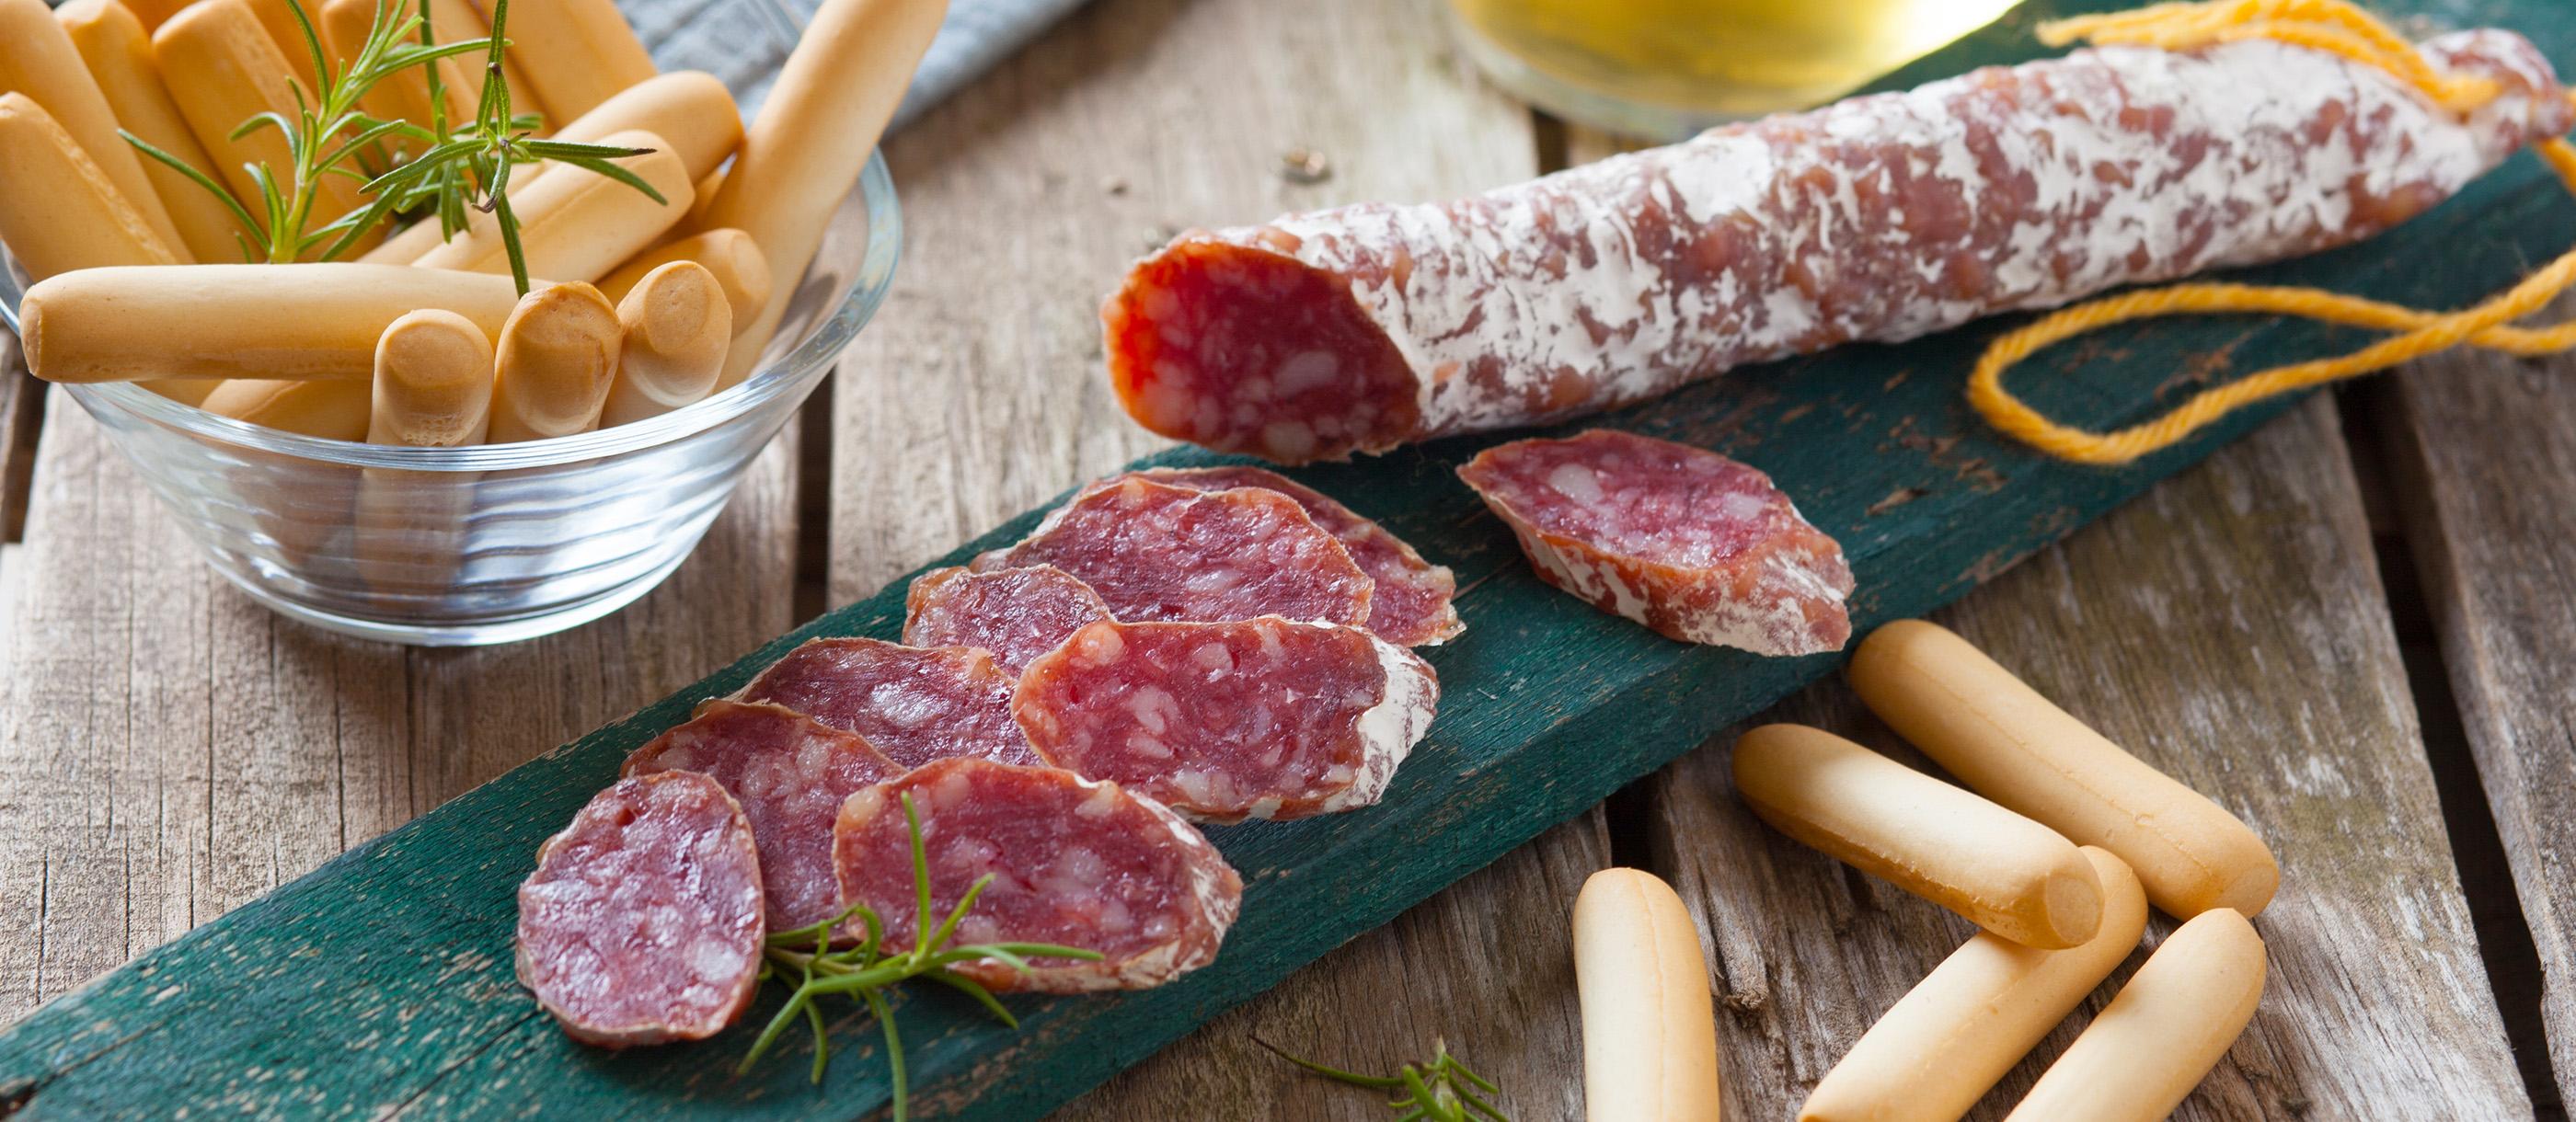 100 Most Popular European Sausages And Salamis Tasteatlas